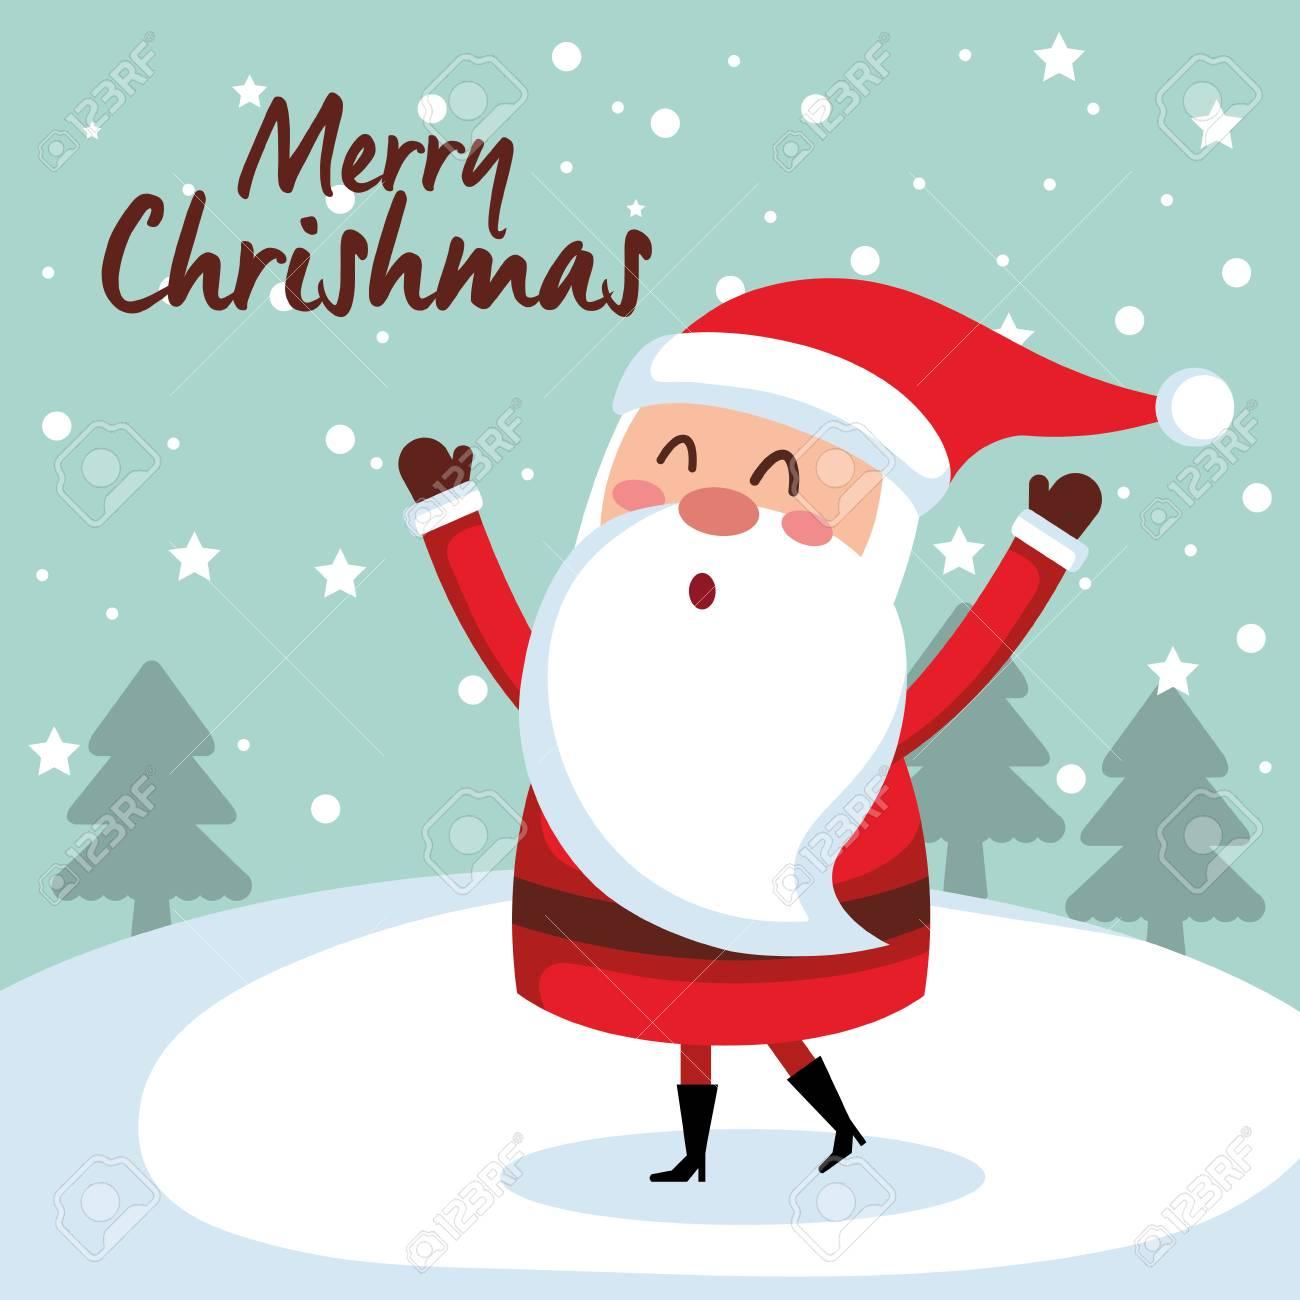 merry christmas santa character vector illustration design - 88433845